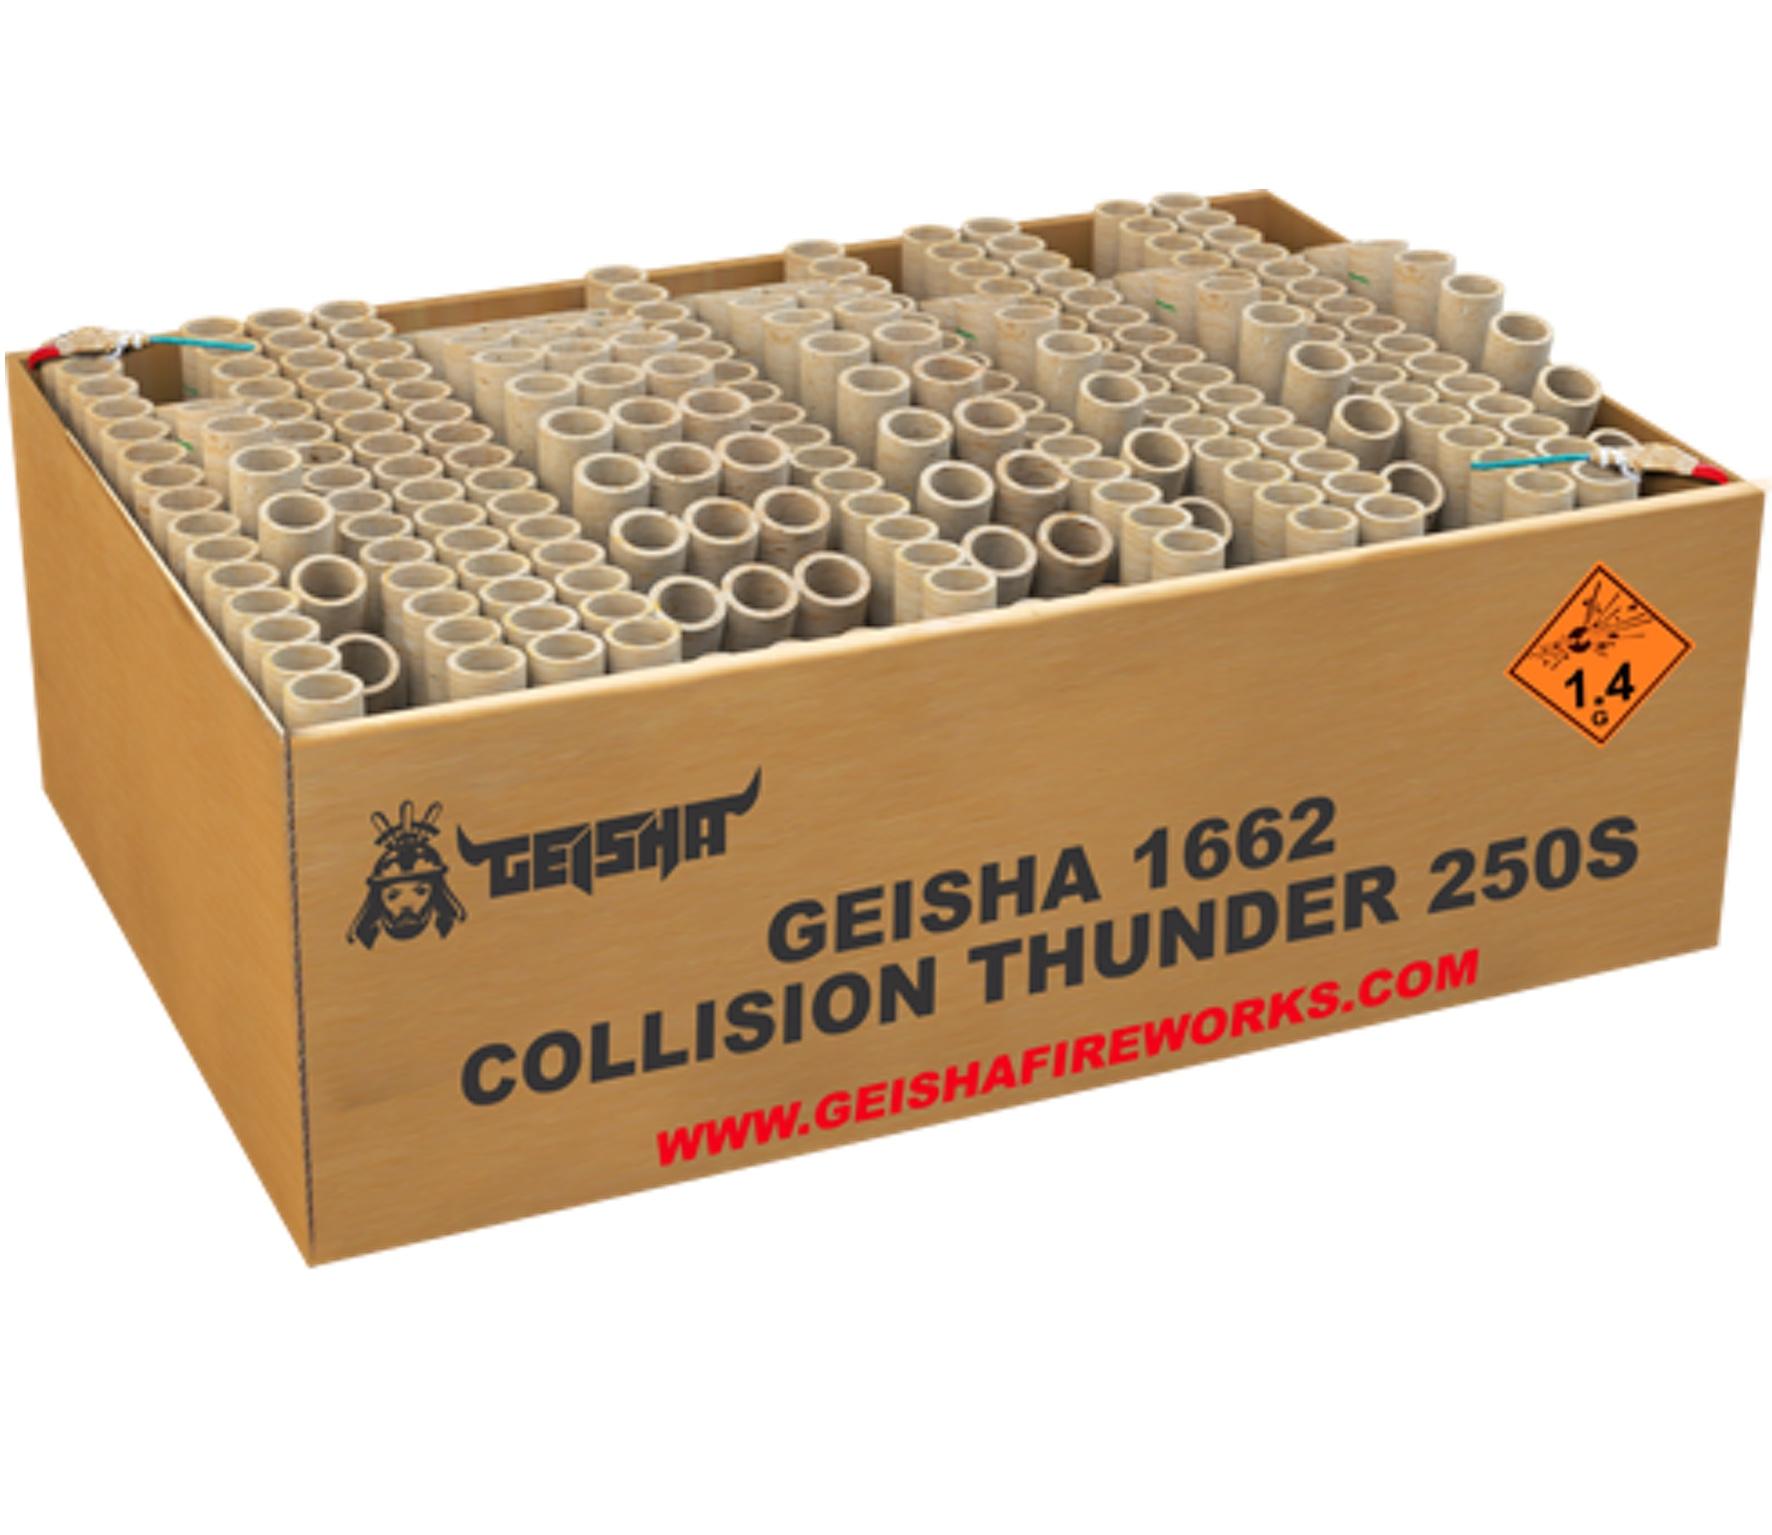 Collision Thunder 250 schots